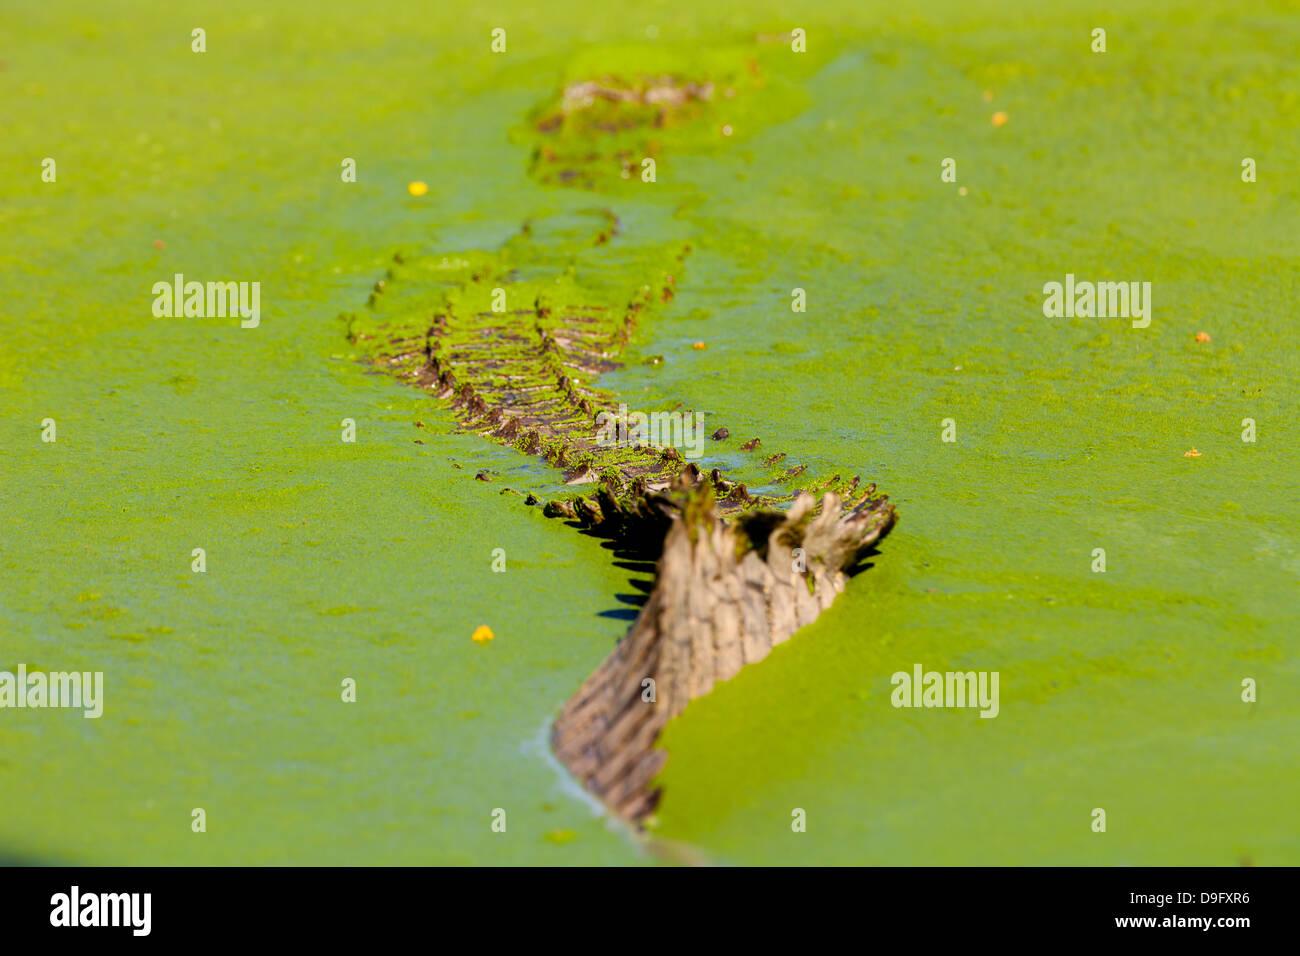 Heck des Krokodils verschwand in Grünalgen Wasser, Western Cape, Südafrika, Afrika Stockbild